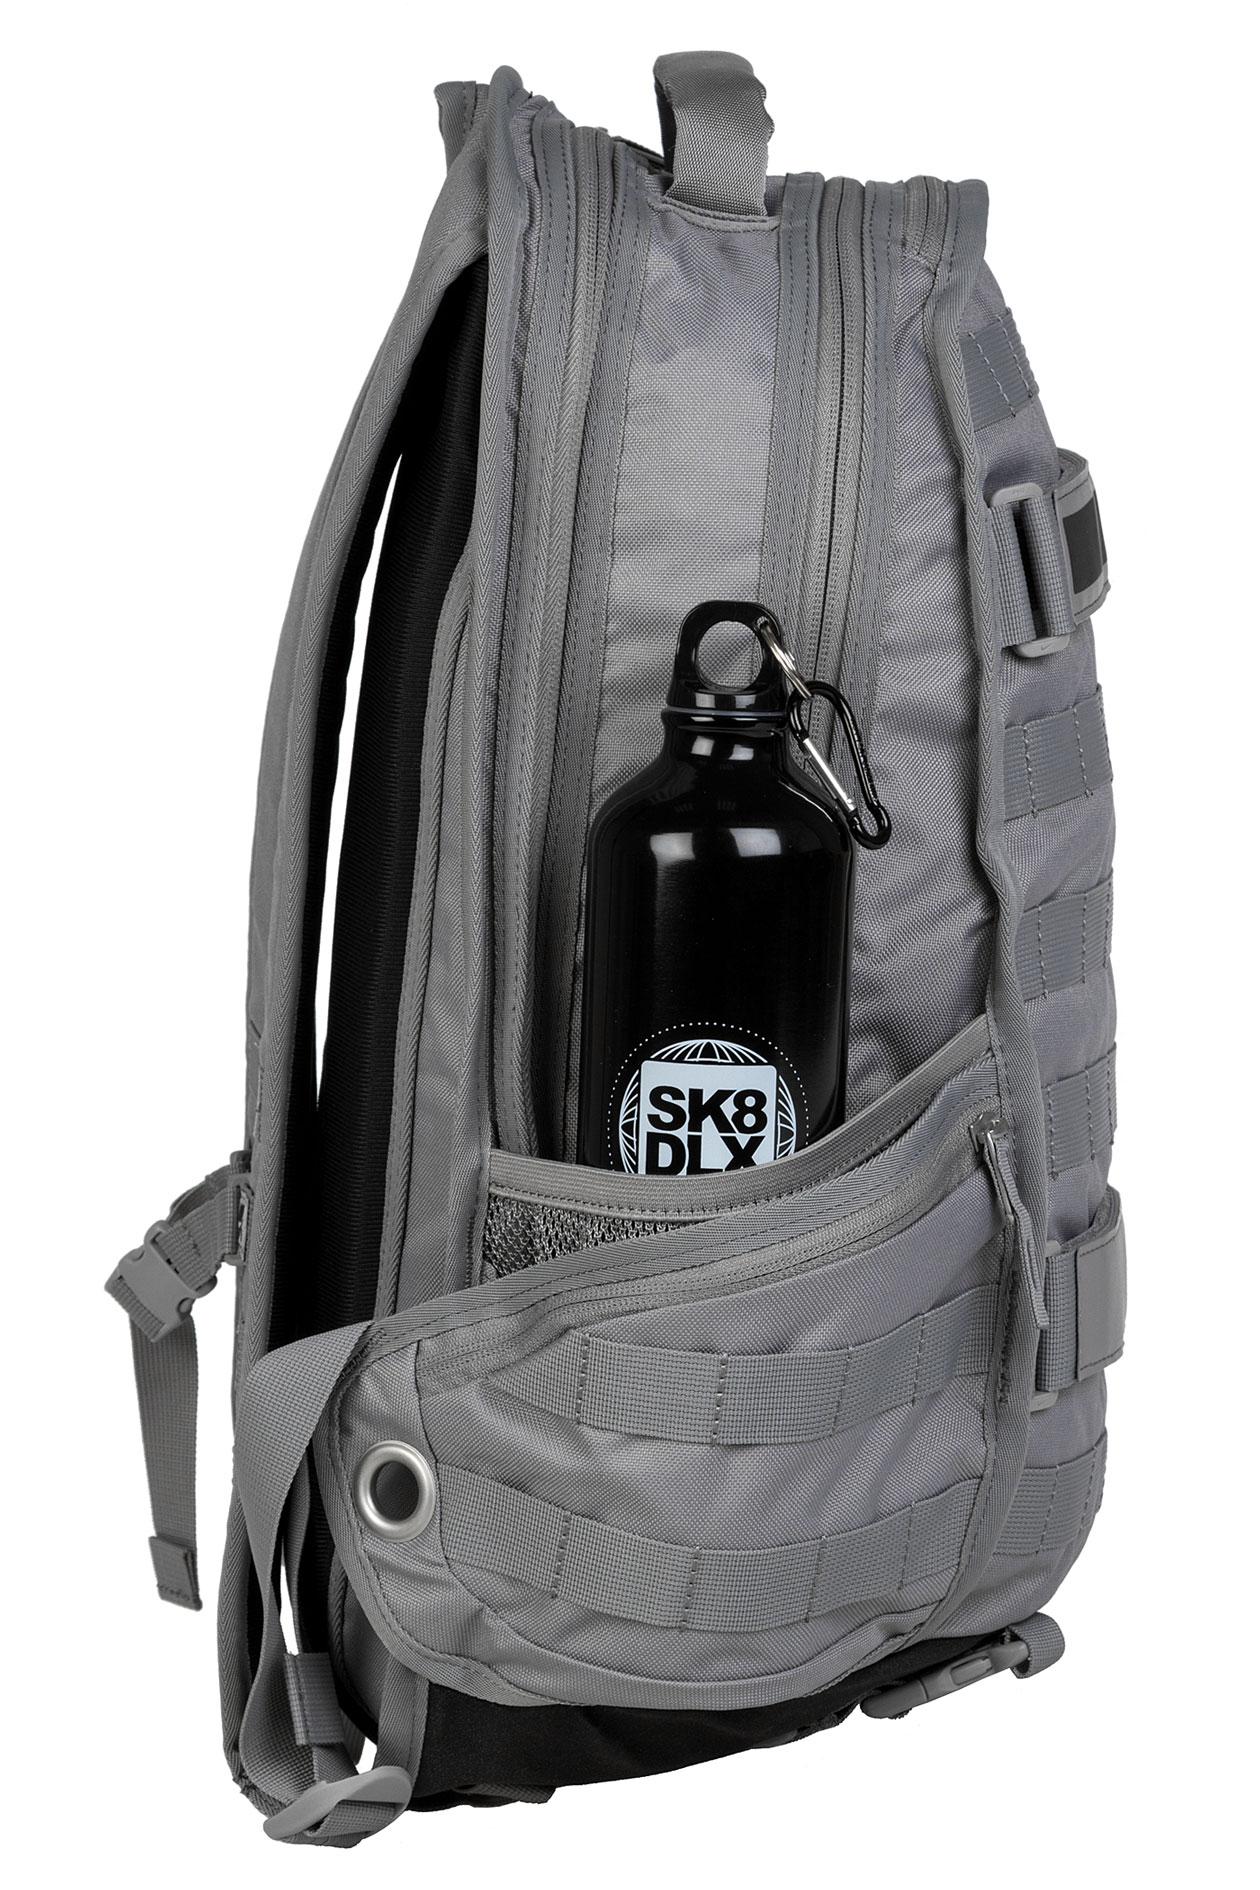 dcda46be158 Buy cheap Online,cheap nike sb rpm backpack